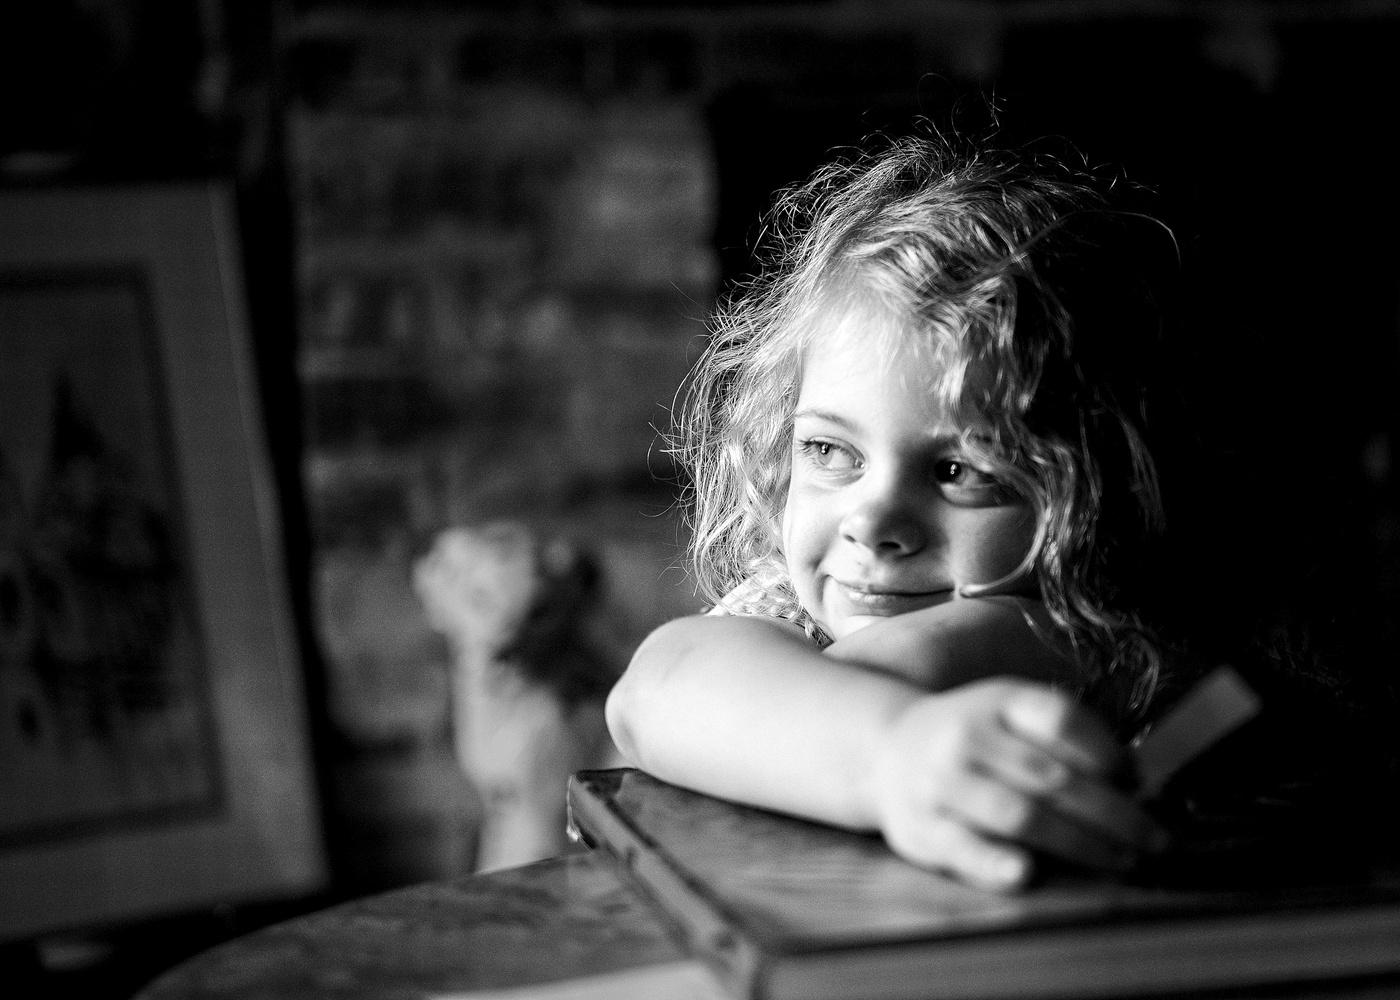 Mischievous Maggie by Matt Bennett